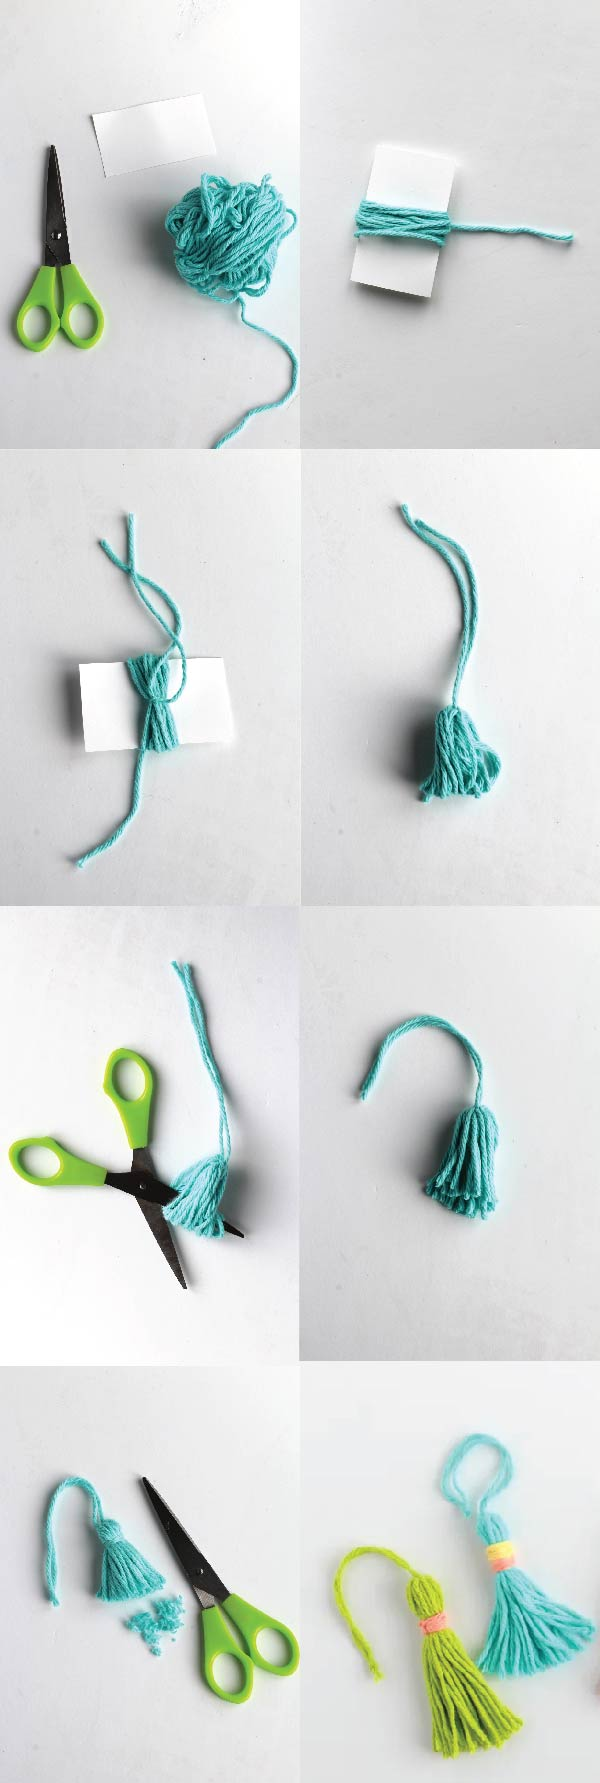 how to make a yarn tassel DIY